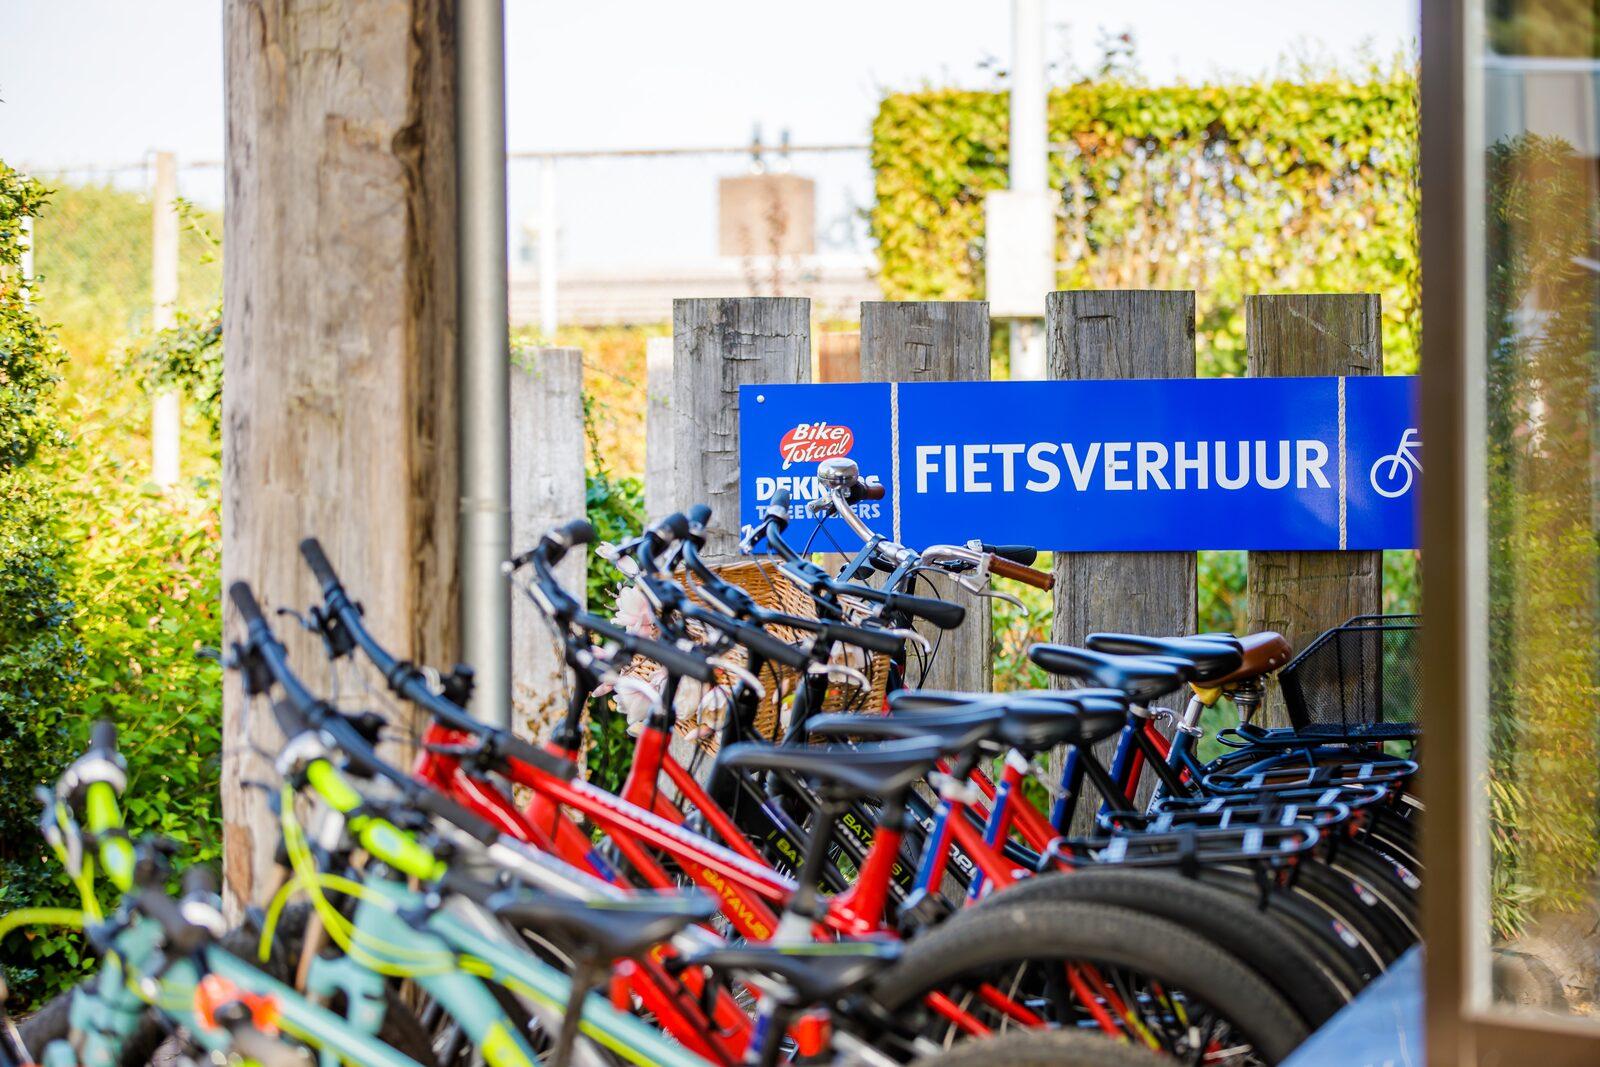 Fahrrad- und Motorrollerverleih